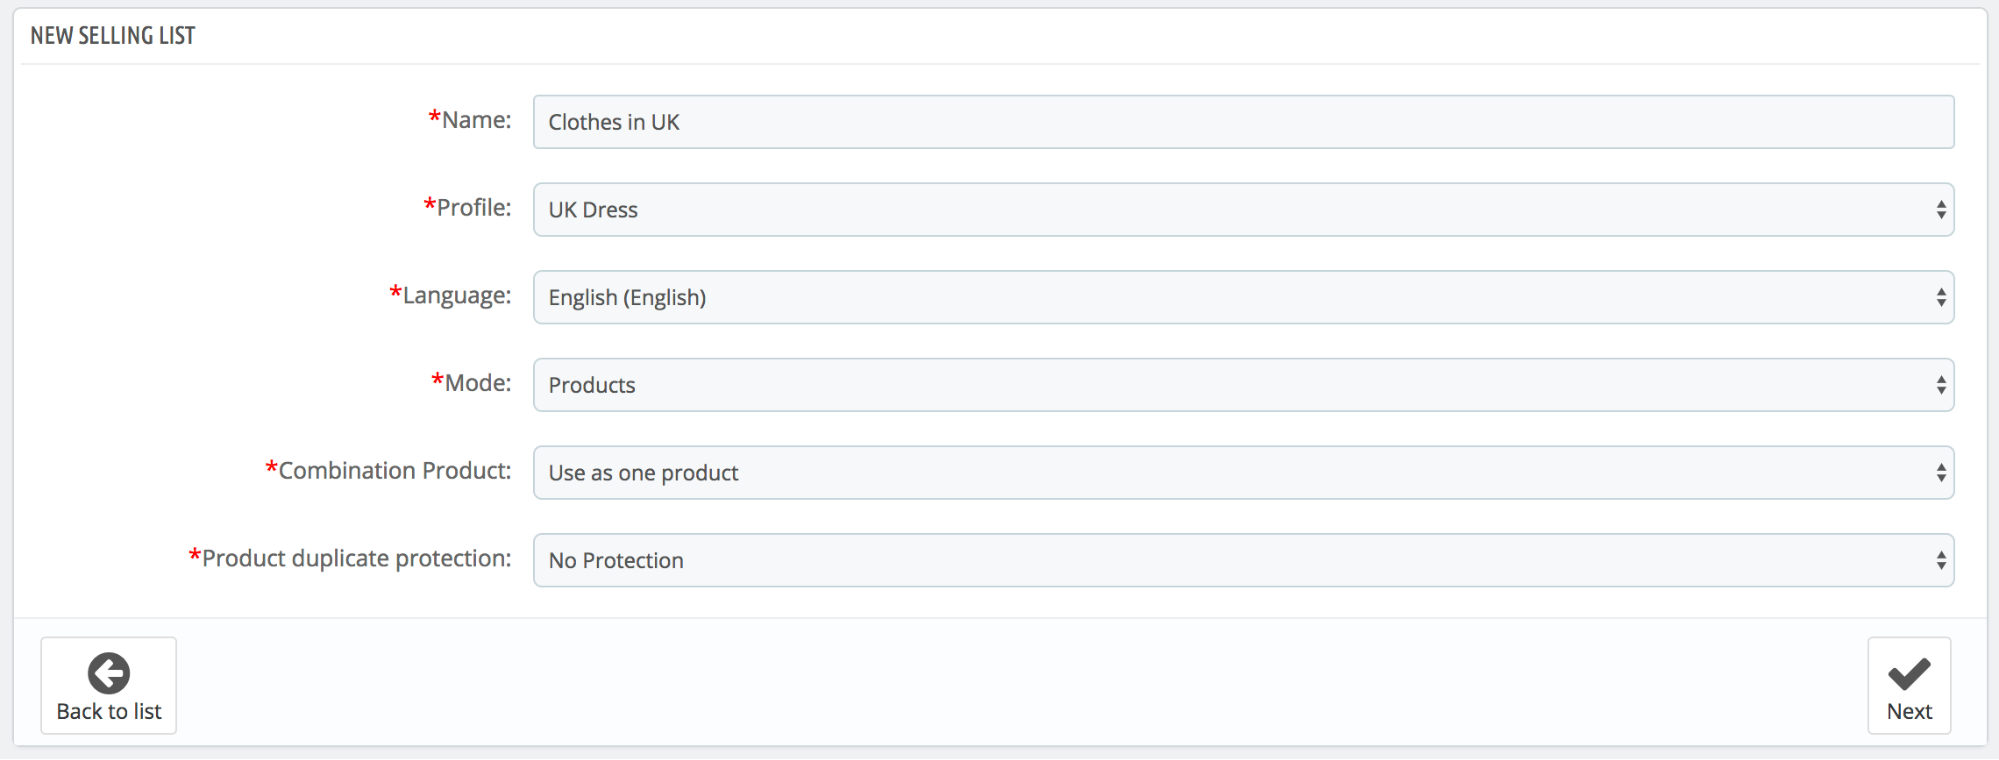 PrestaShop ebay module — Create New Selling List